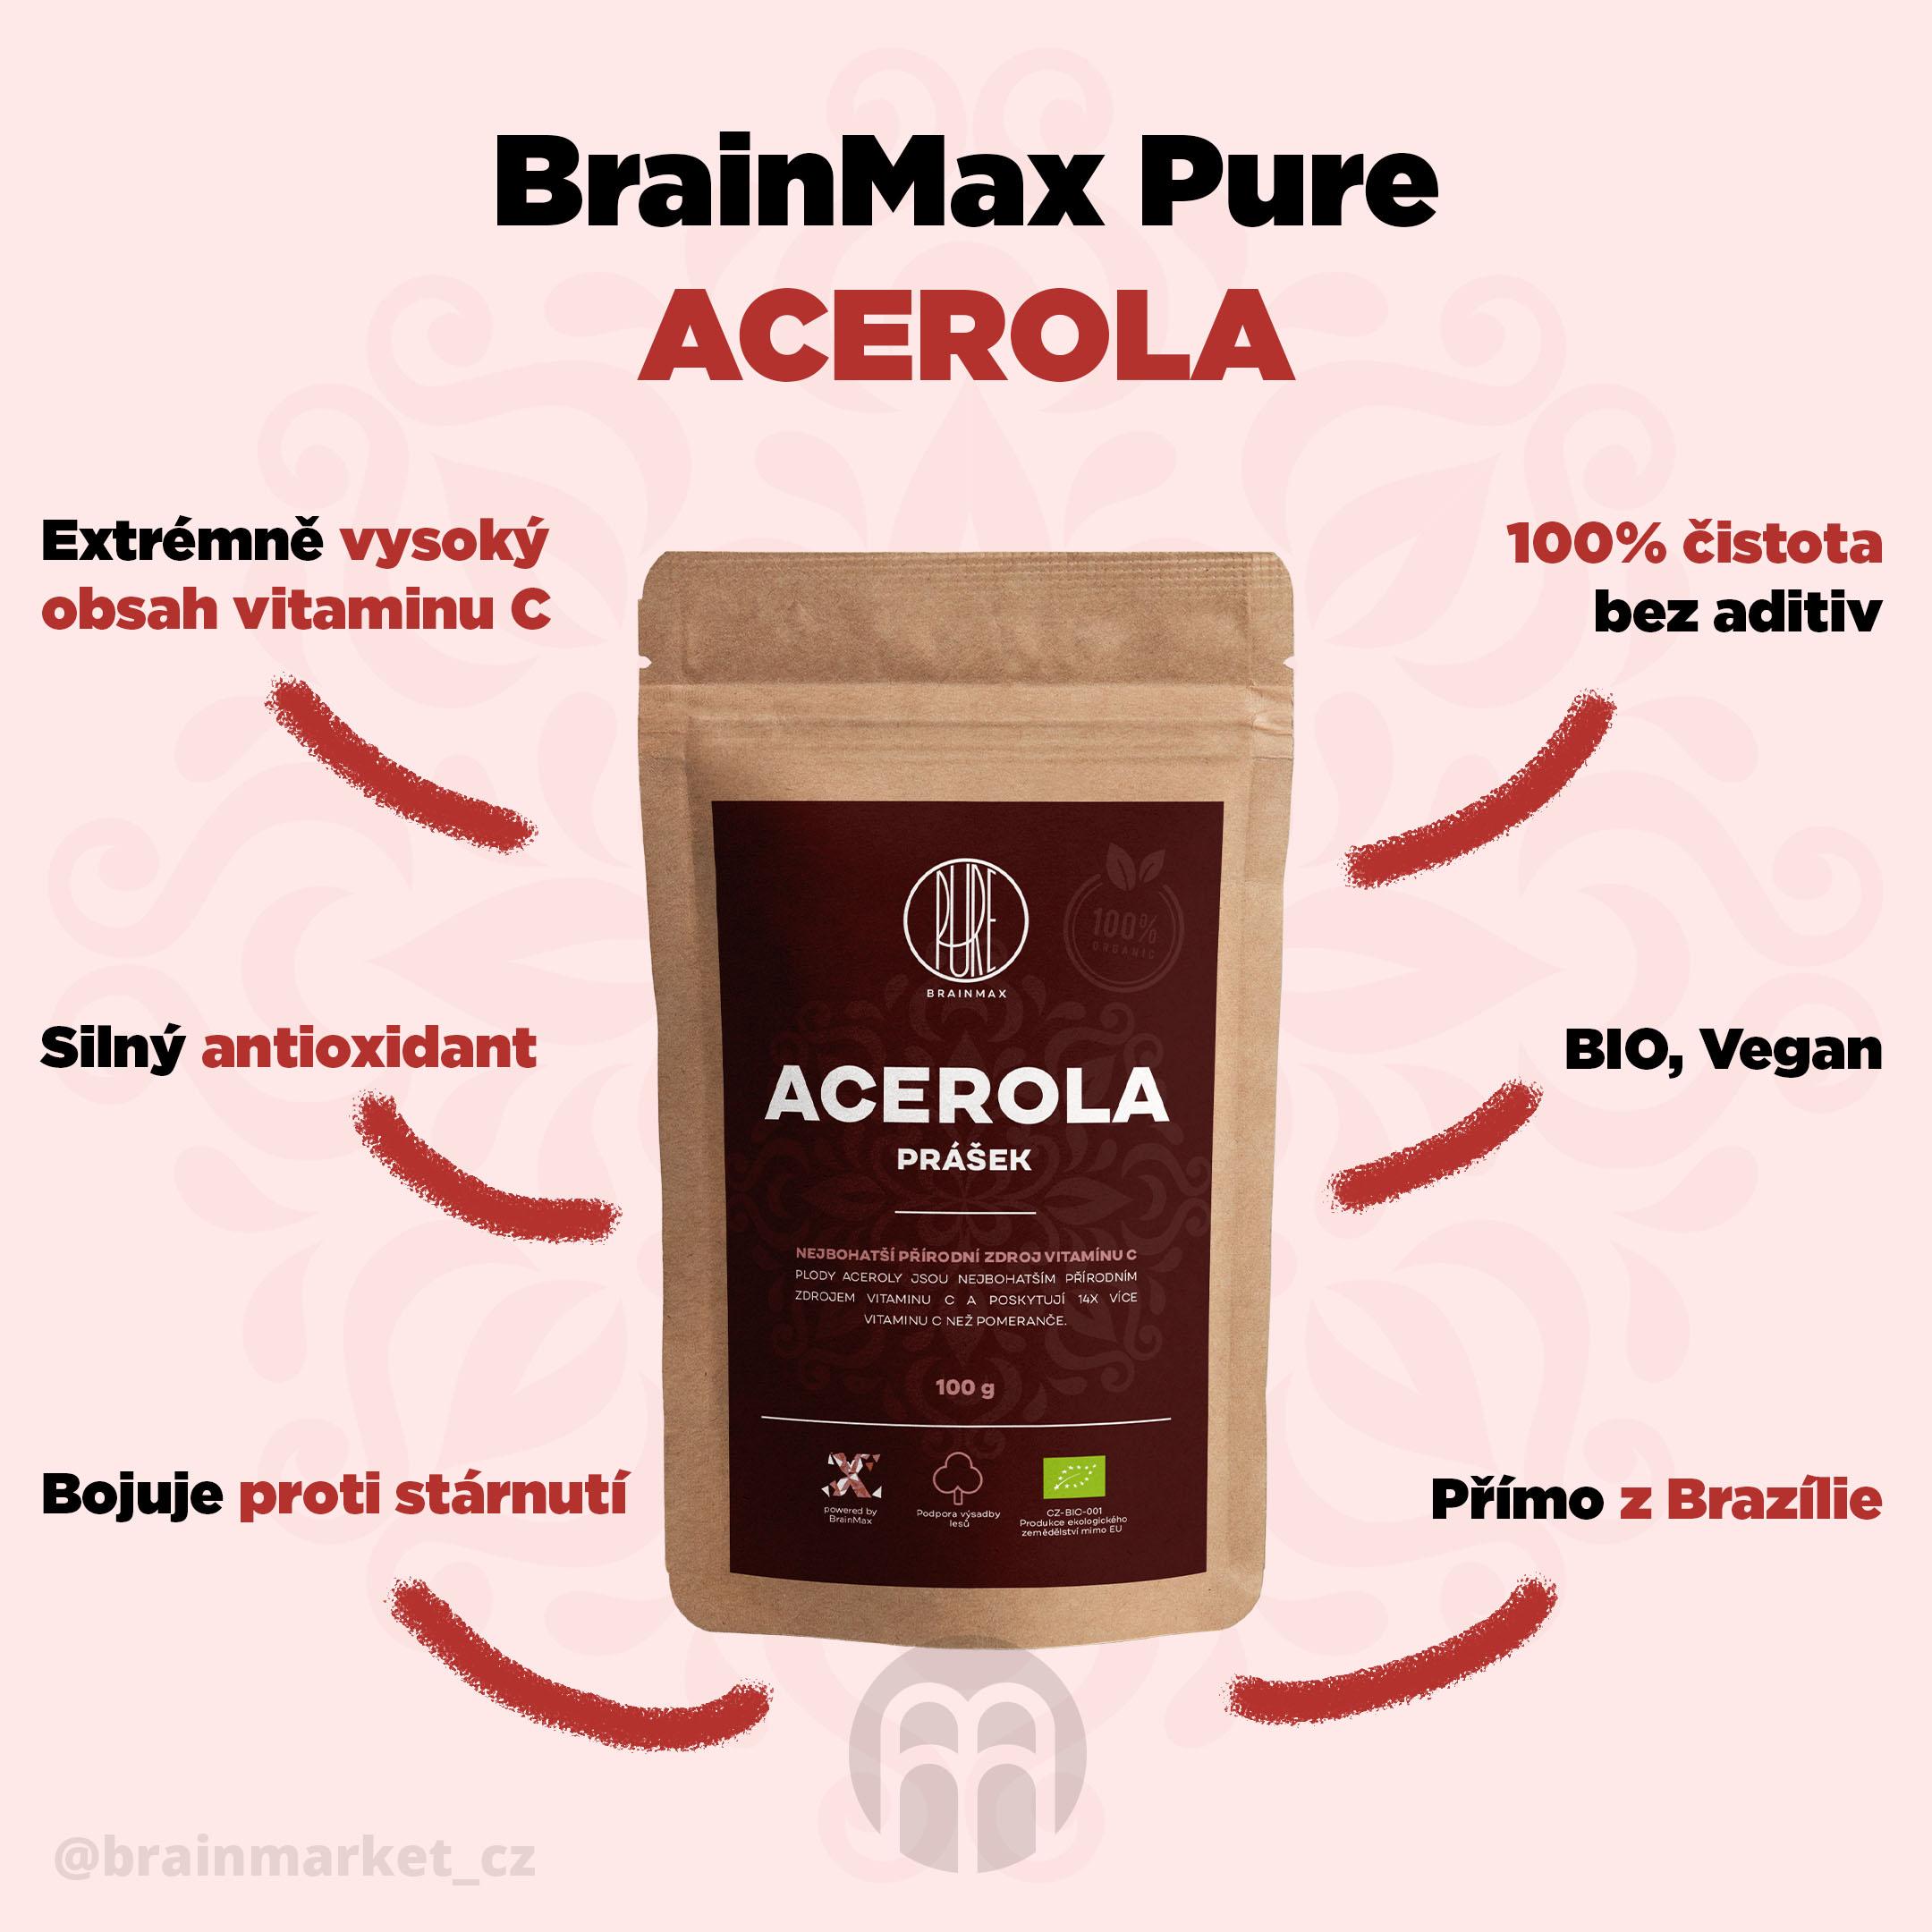 acerola-brainmax-pure-infografika-brainmarket-cz